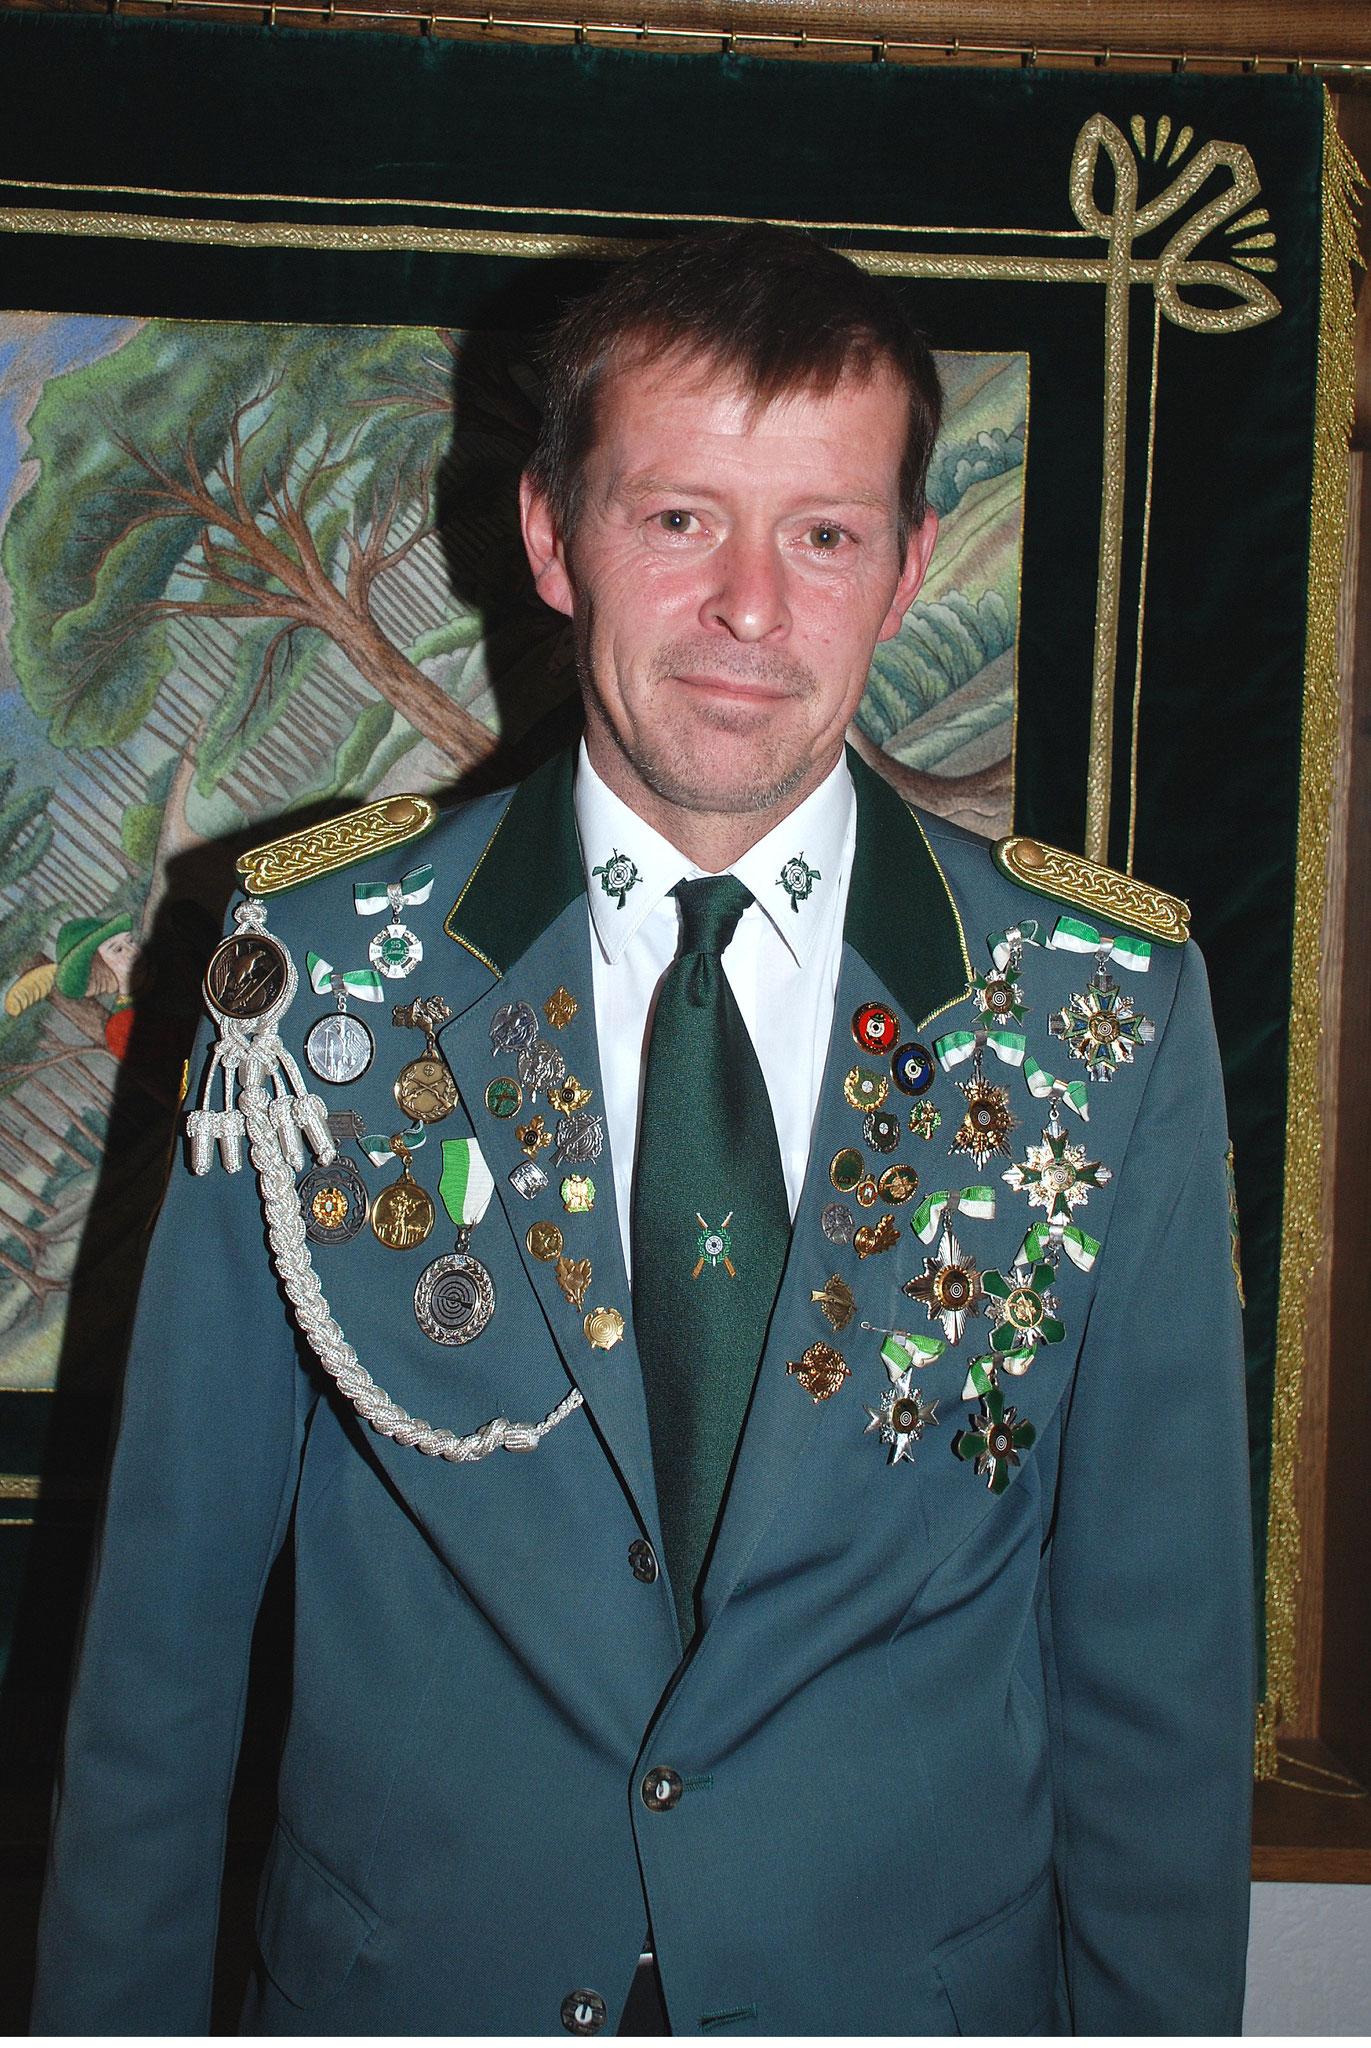 Johannes Kuhr